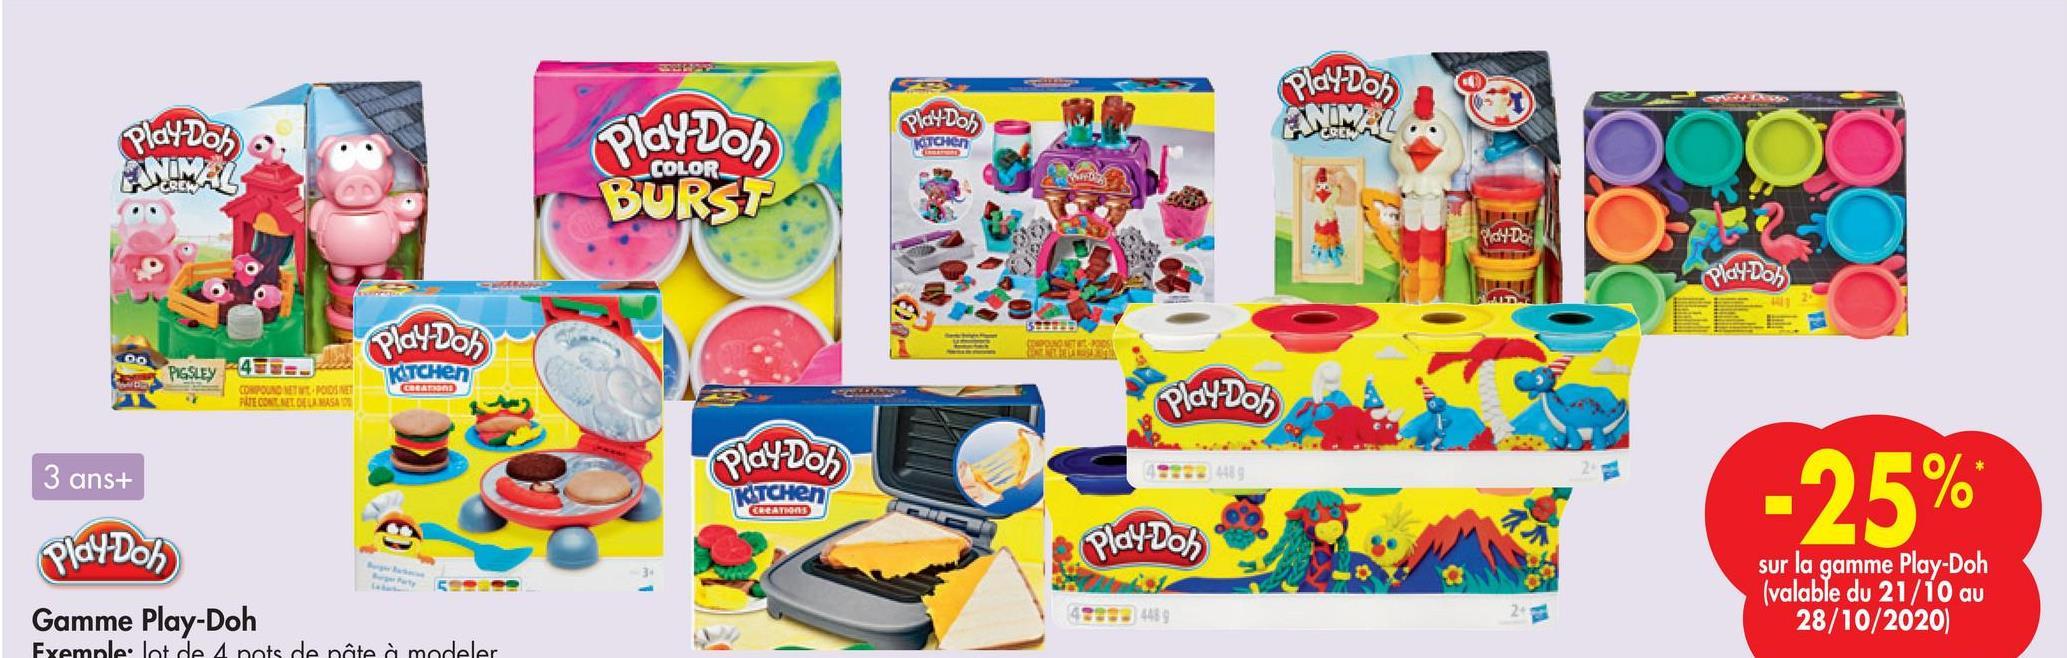 Play-Doh ONIMAL Play Doh play-Dos OUTCHEN Play Doh BURST dy-Da Playdon Play Doh DON OO PIGSLEY KITCHen CREATOR . DAPOUND MET POINT PRECONTOUASA Play Doh 3 ans+ Play-Doh KITCHEN 43 -25% CREATION Play Don Play Doh Gamme Play-Doh sur la gamme Play-Doh (valable du 21/10 au 28/10/2020) Exemple: lot de A pots de pâte à modeler